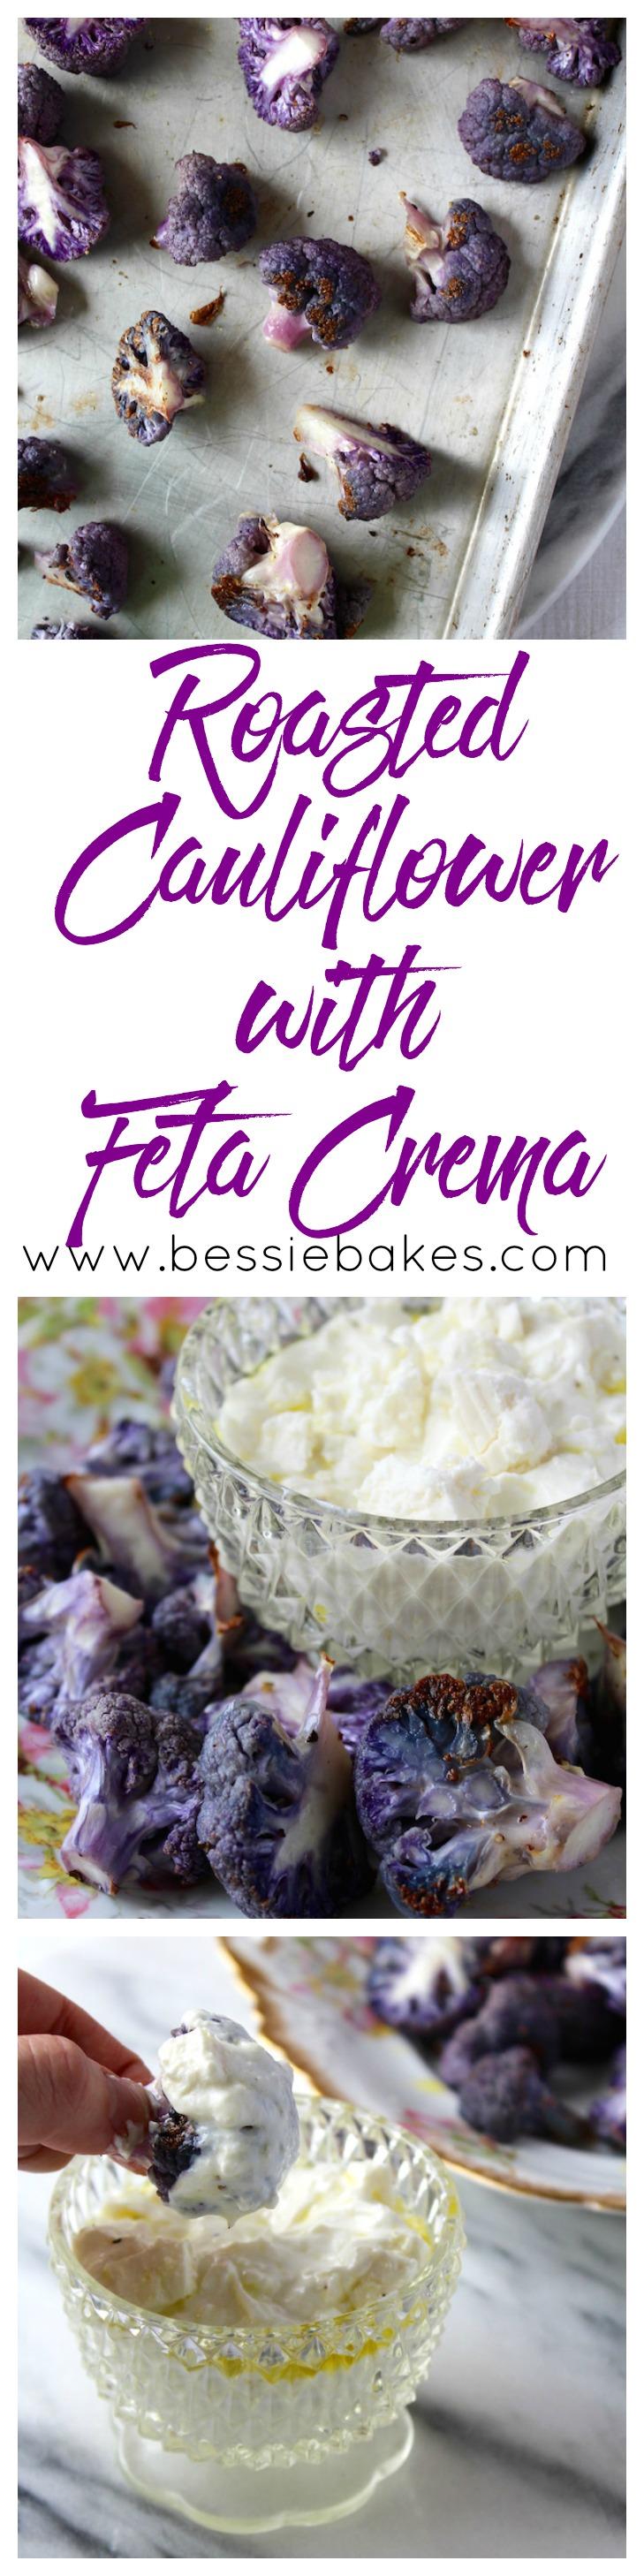 Roasted Cauliflower with Feta Crema